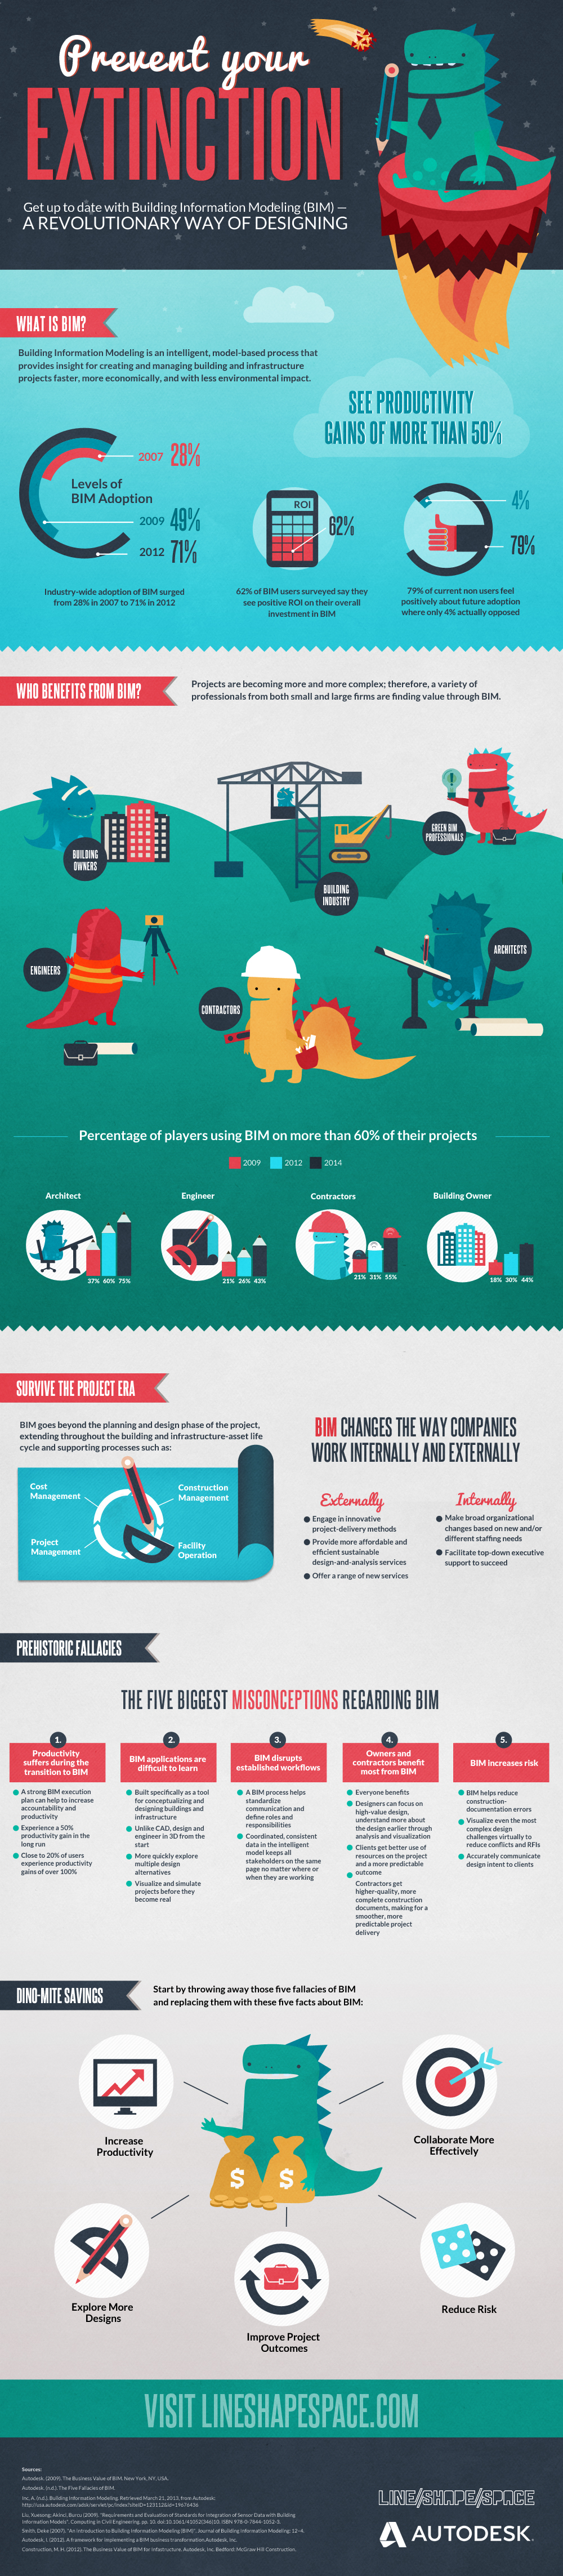 Prevent Your Extinction: All About BIM